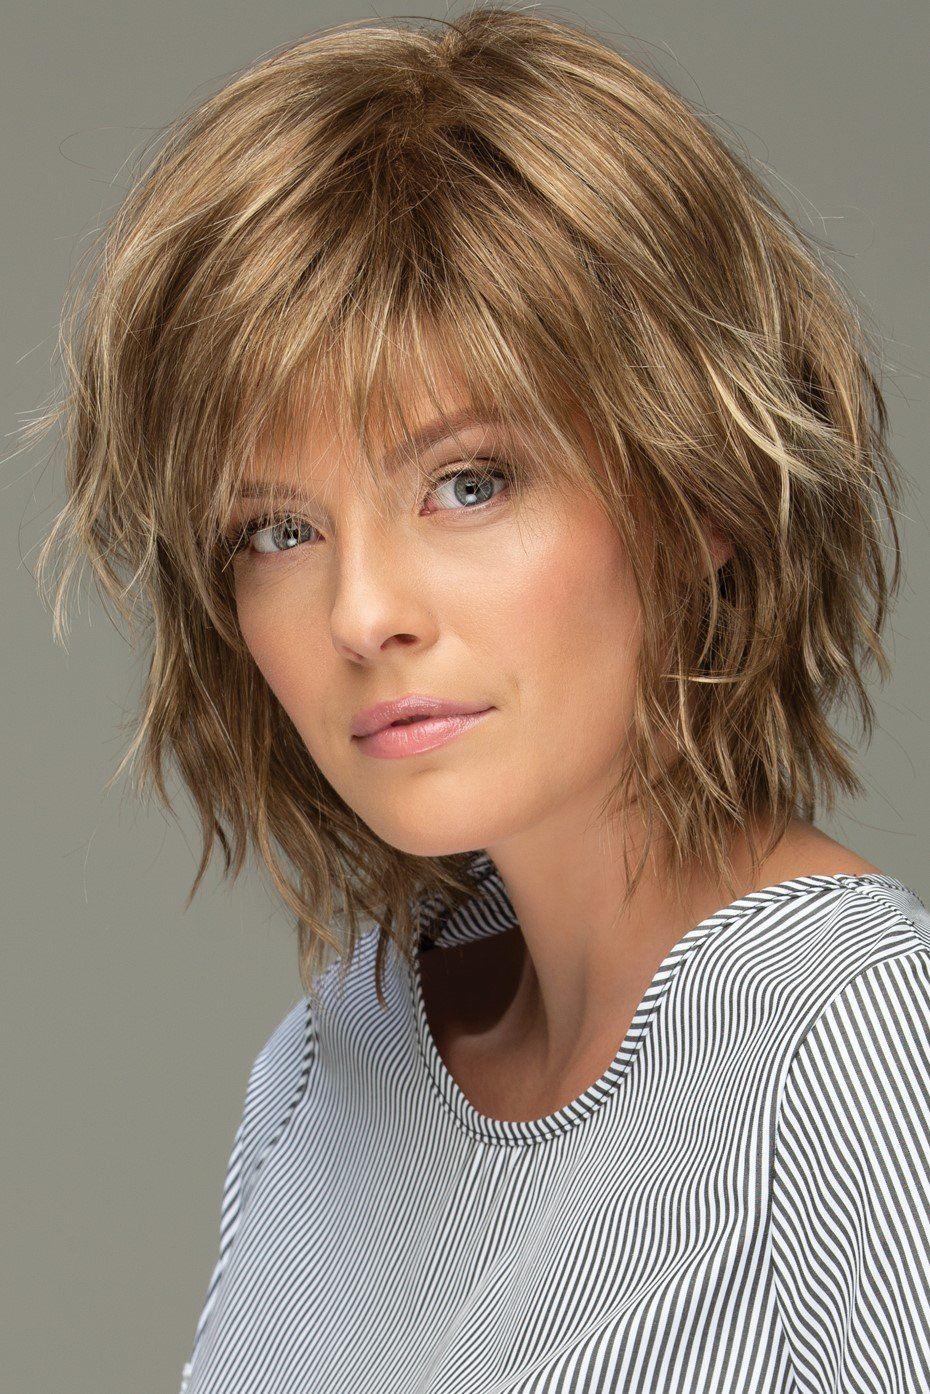 Estetica Wigs - Jones in 2020   Choppy bob hairstyles, Bob ...